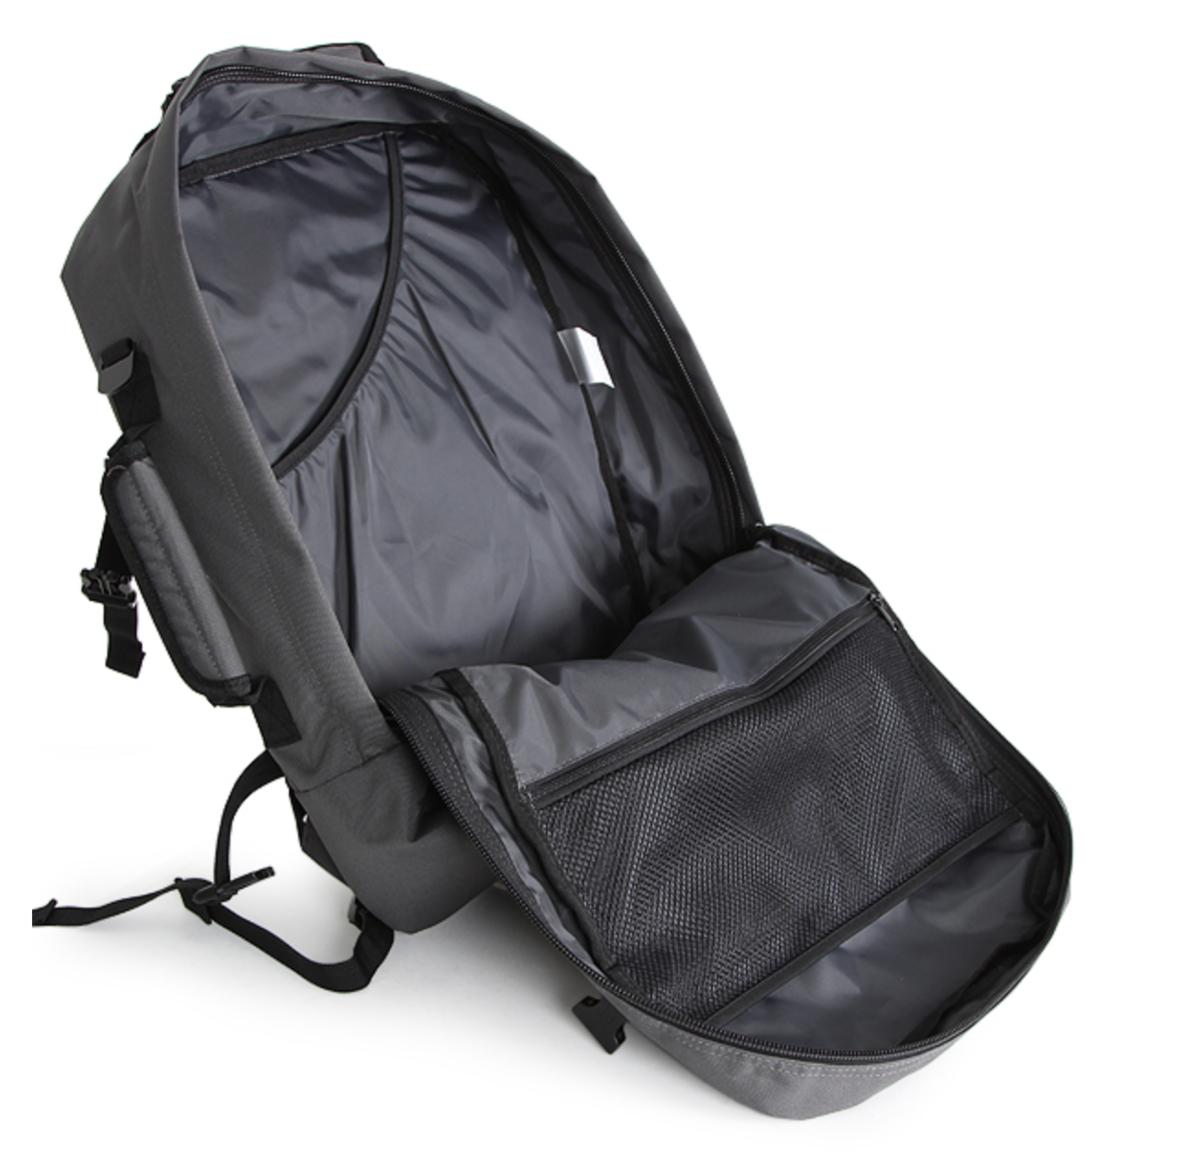 f:id:thebackpack:20190602132952p:plain